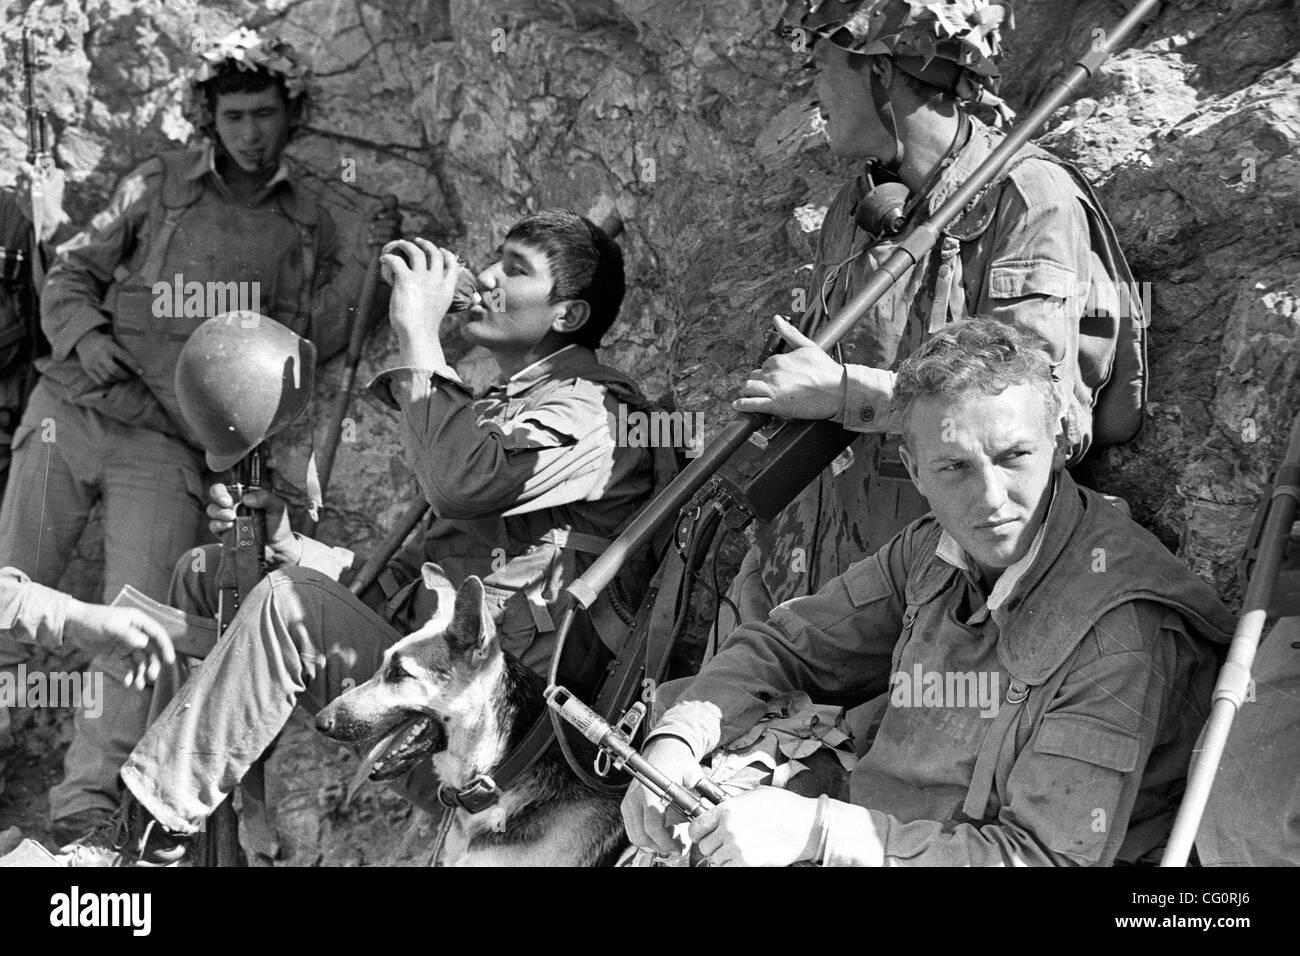 Soviet Afghanistan war - Page 6 Jul-12-2007-kabul-afghanistan-the-soviet-war-in-afghanistan-was-a-CG0RJ6